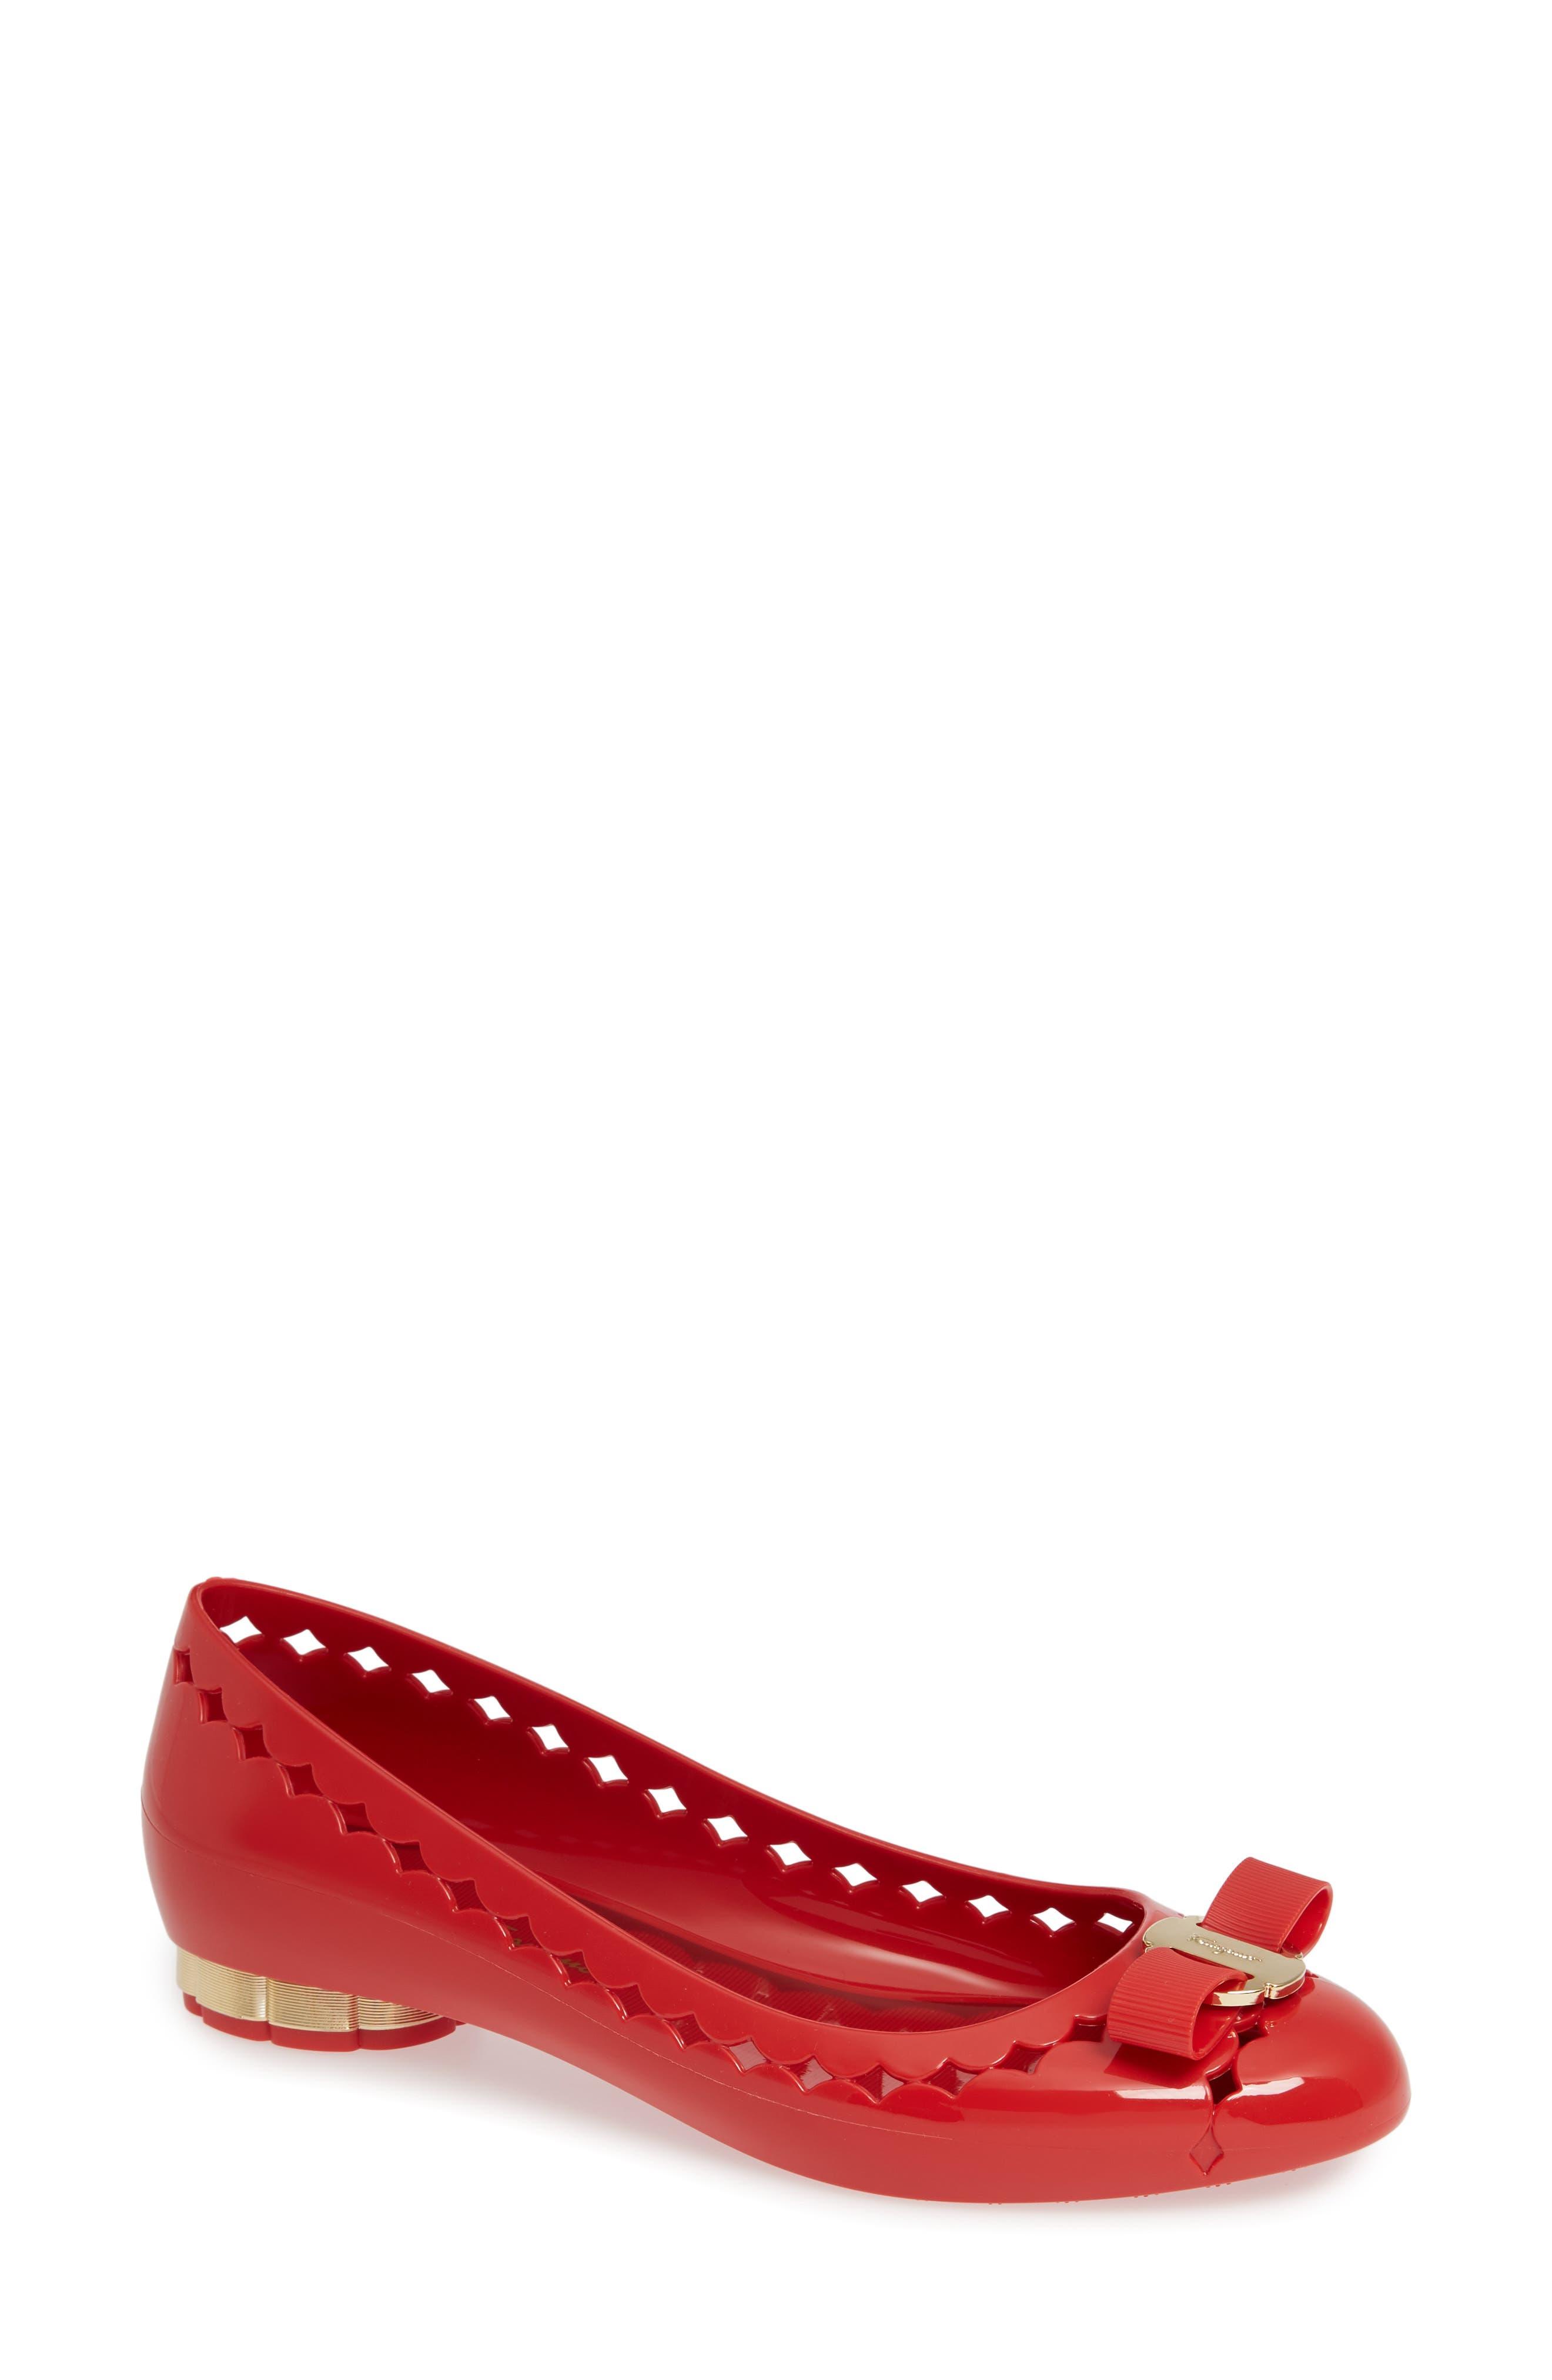 Jelly Ballerina Flat in Red